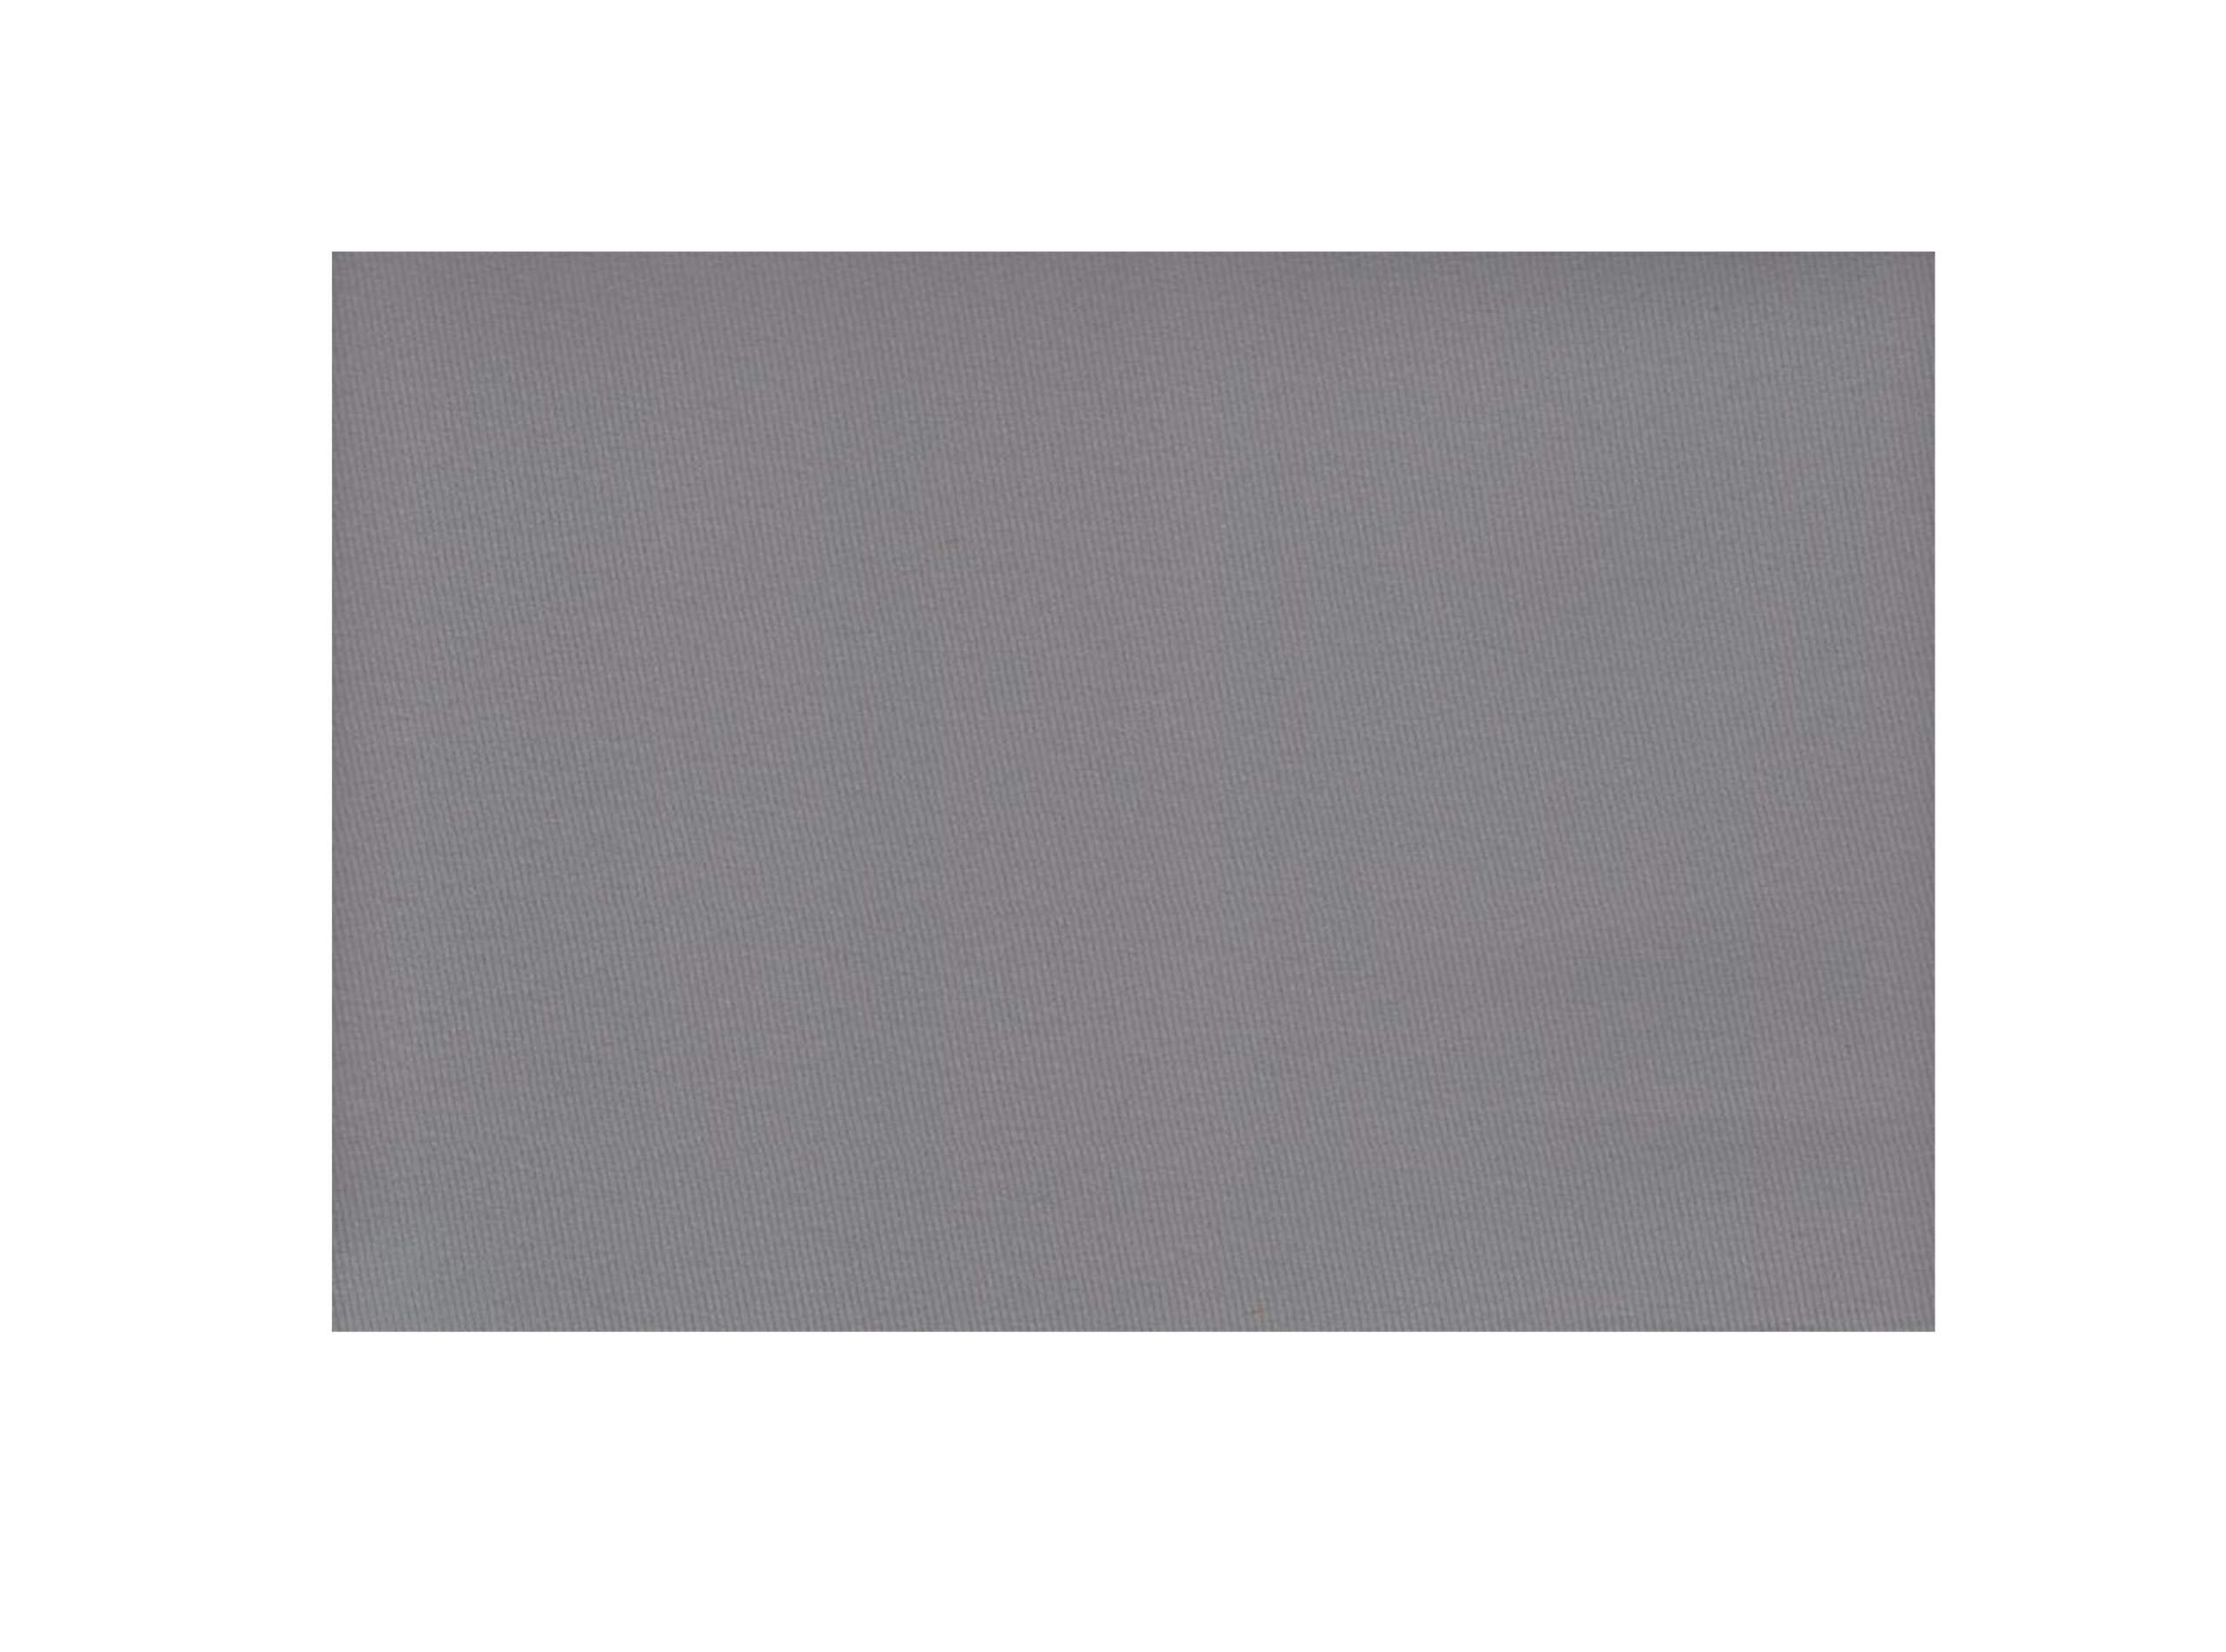 "Headliner Doctor Foam Backed Light Gray auto Headliner DIY Repair Fabric- 72"" x 60"""